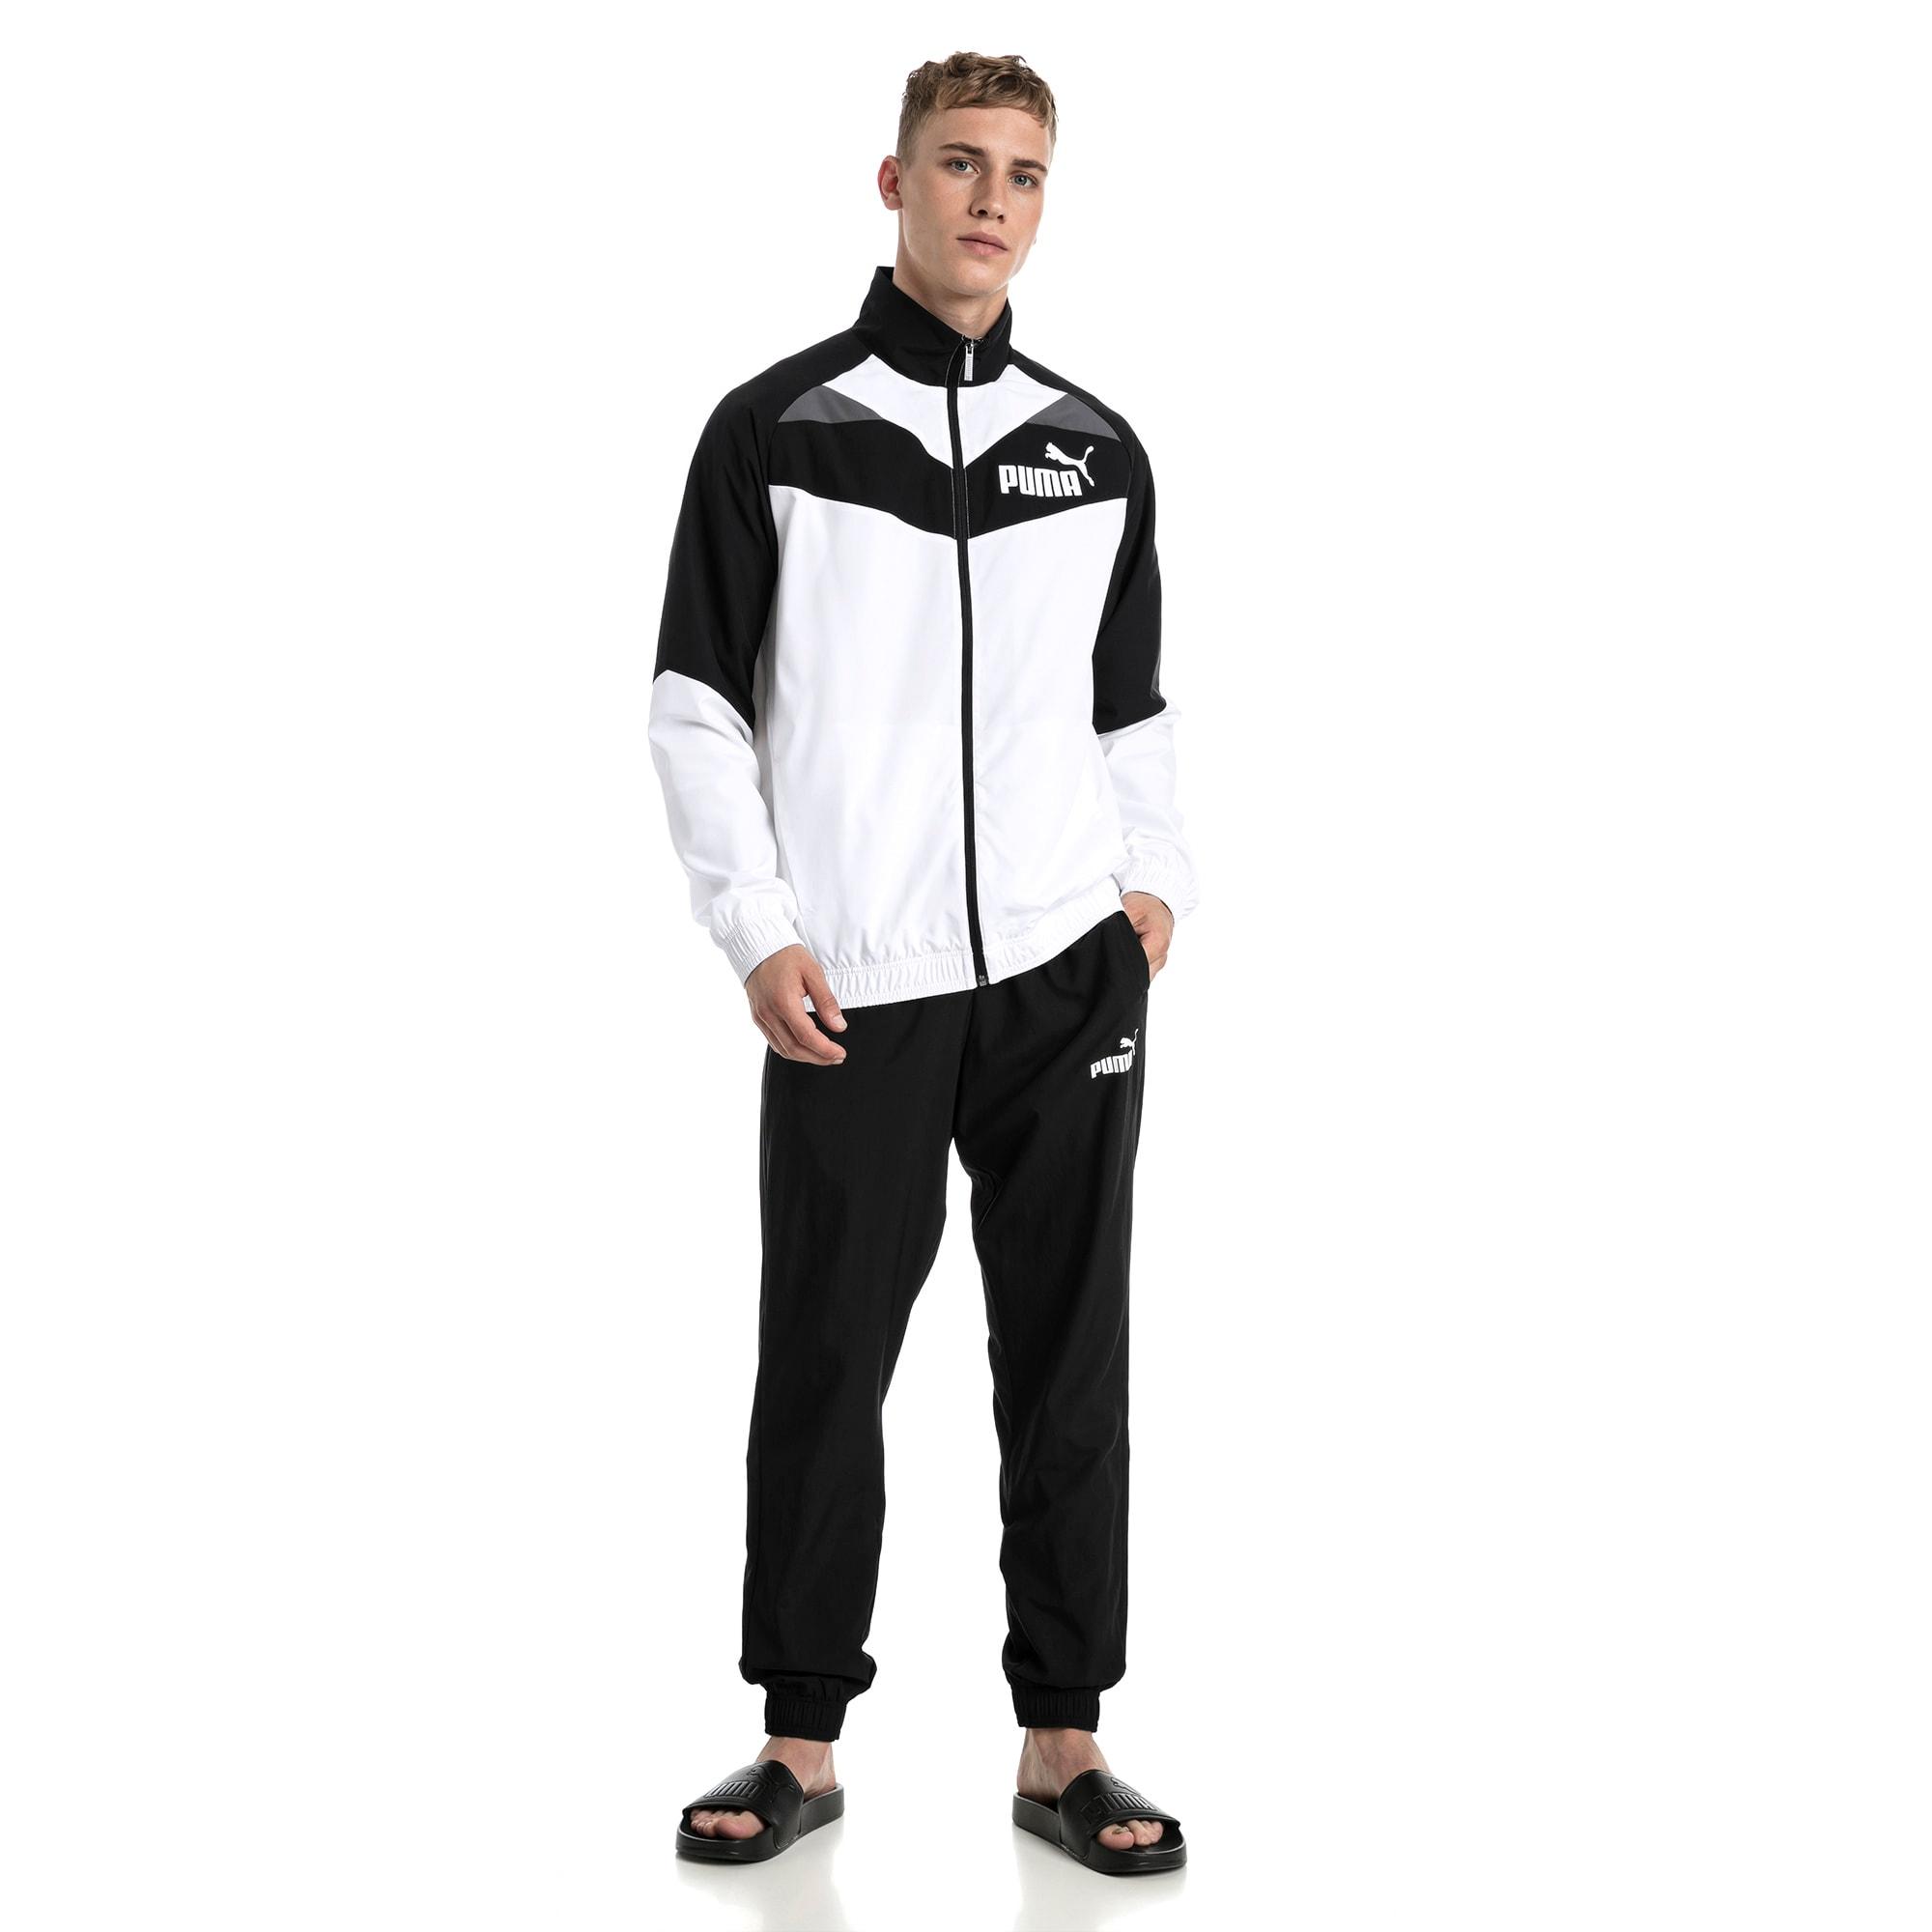 Herren Iconic Gewebter Trainingsanzug | PUMA Sale | PUMA